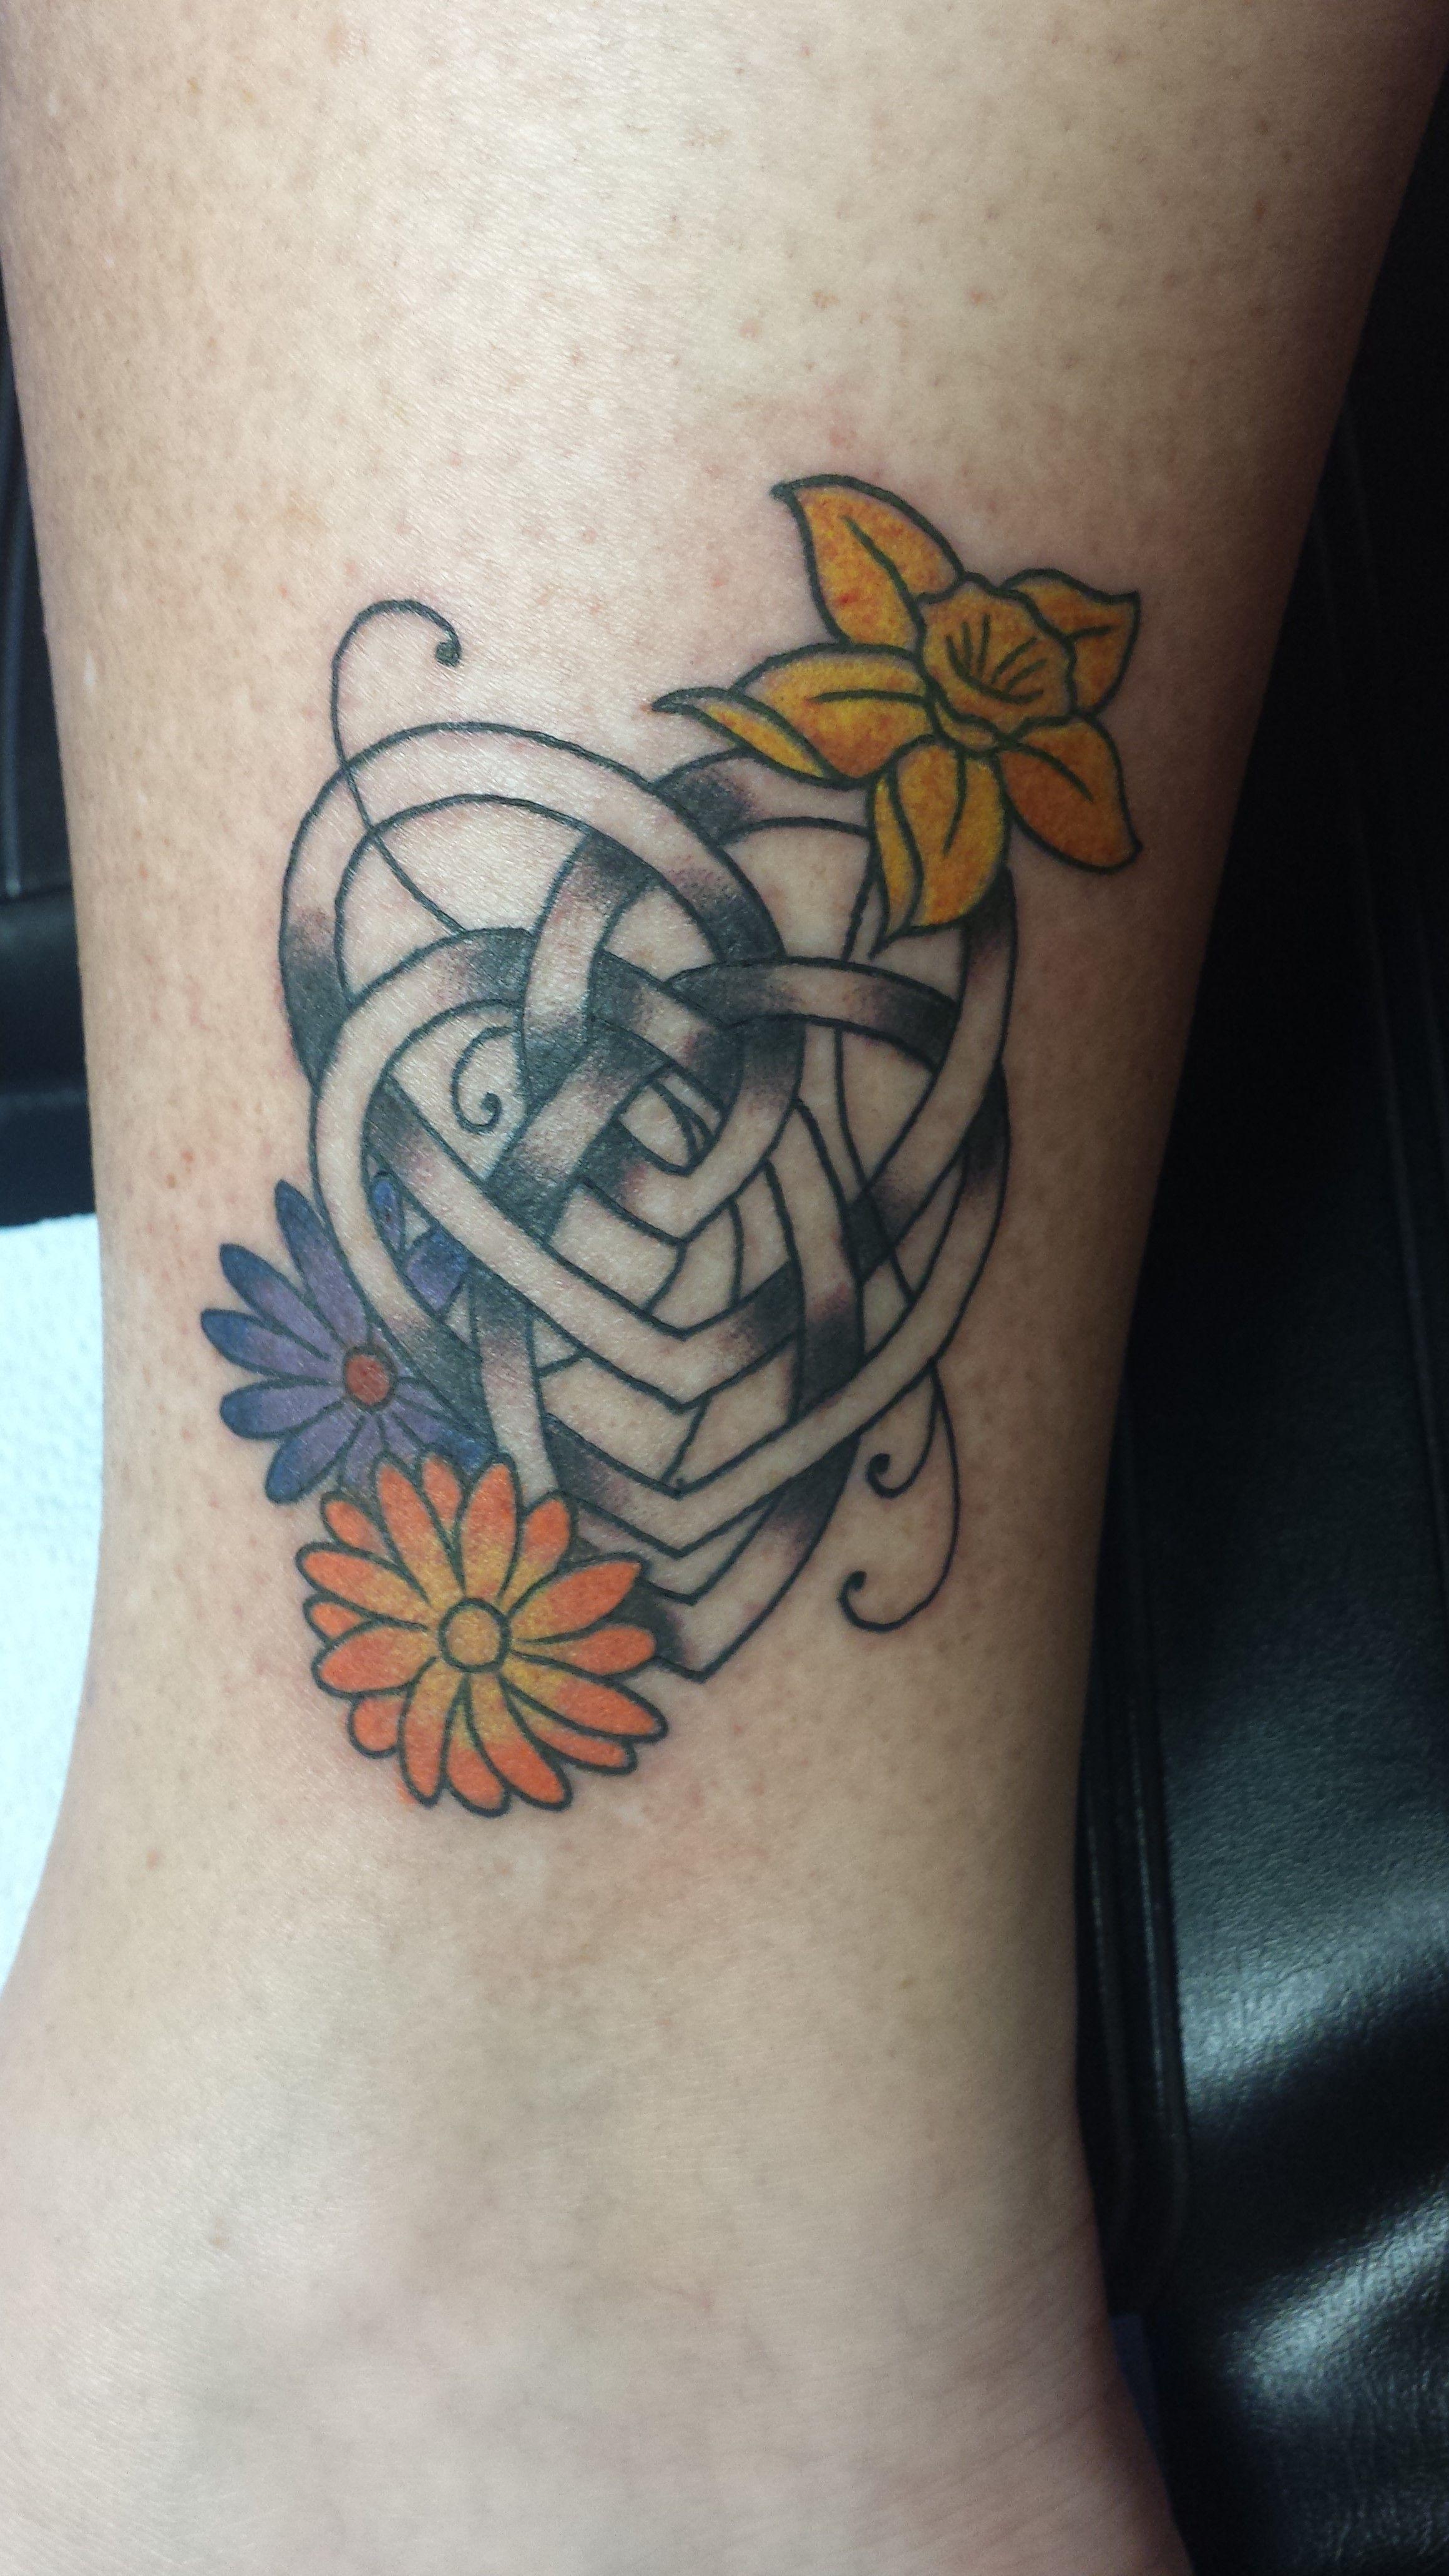 My Latest Tattoo Celtic Symbol For Motherhood With My Girls Birth Flowers Birth Flower Tattoos Tattoos Flower Tattoo